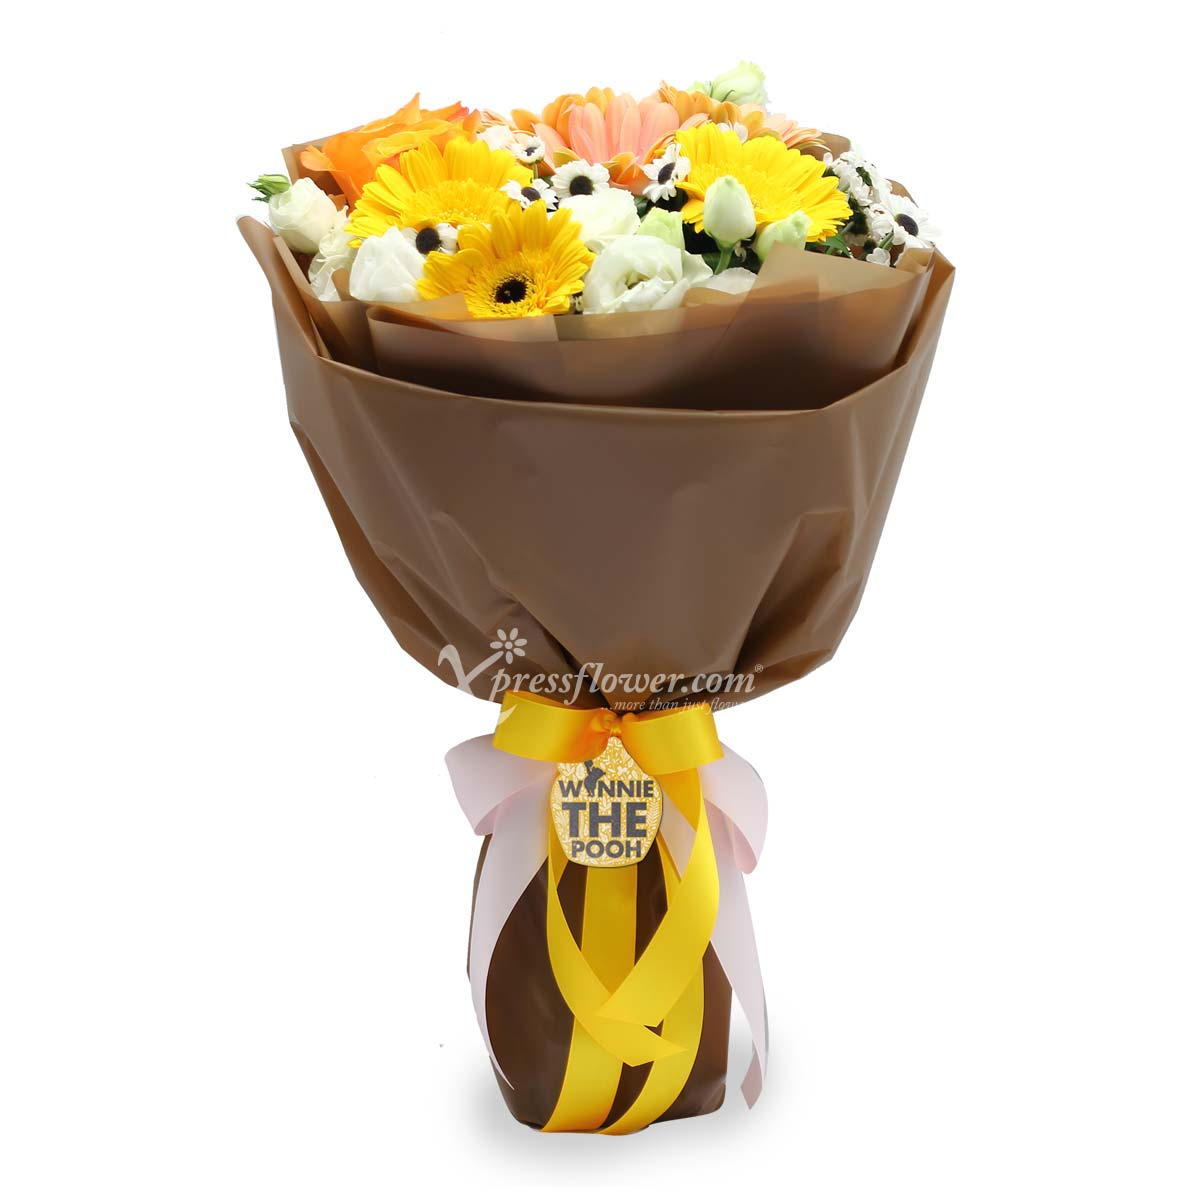 DSBQ1805 Sweet Hunny bouquet